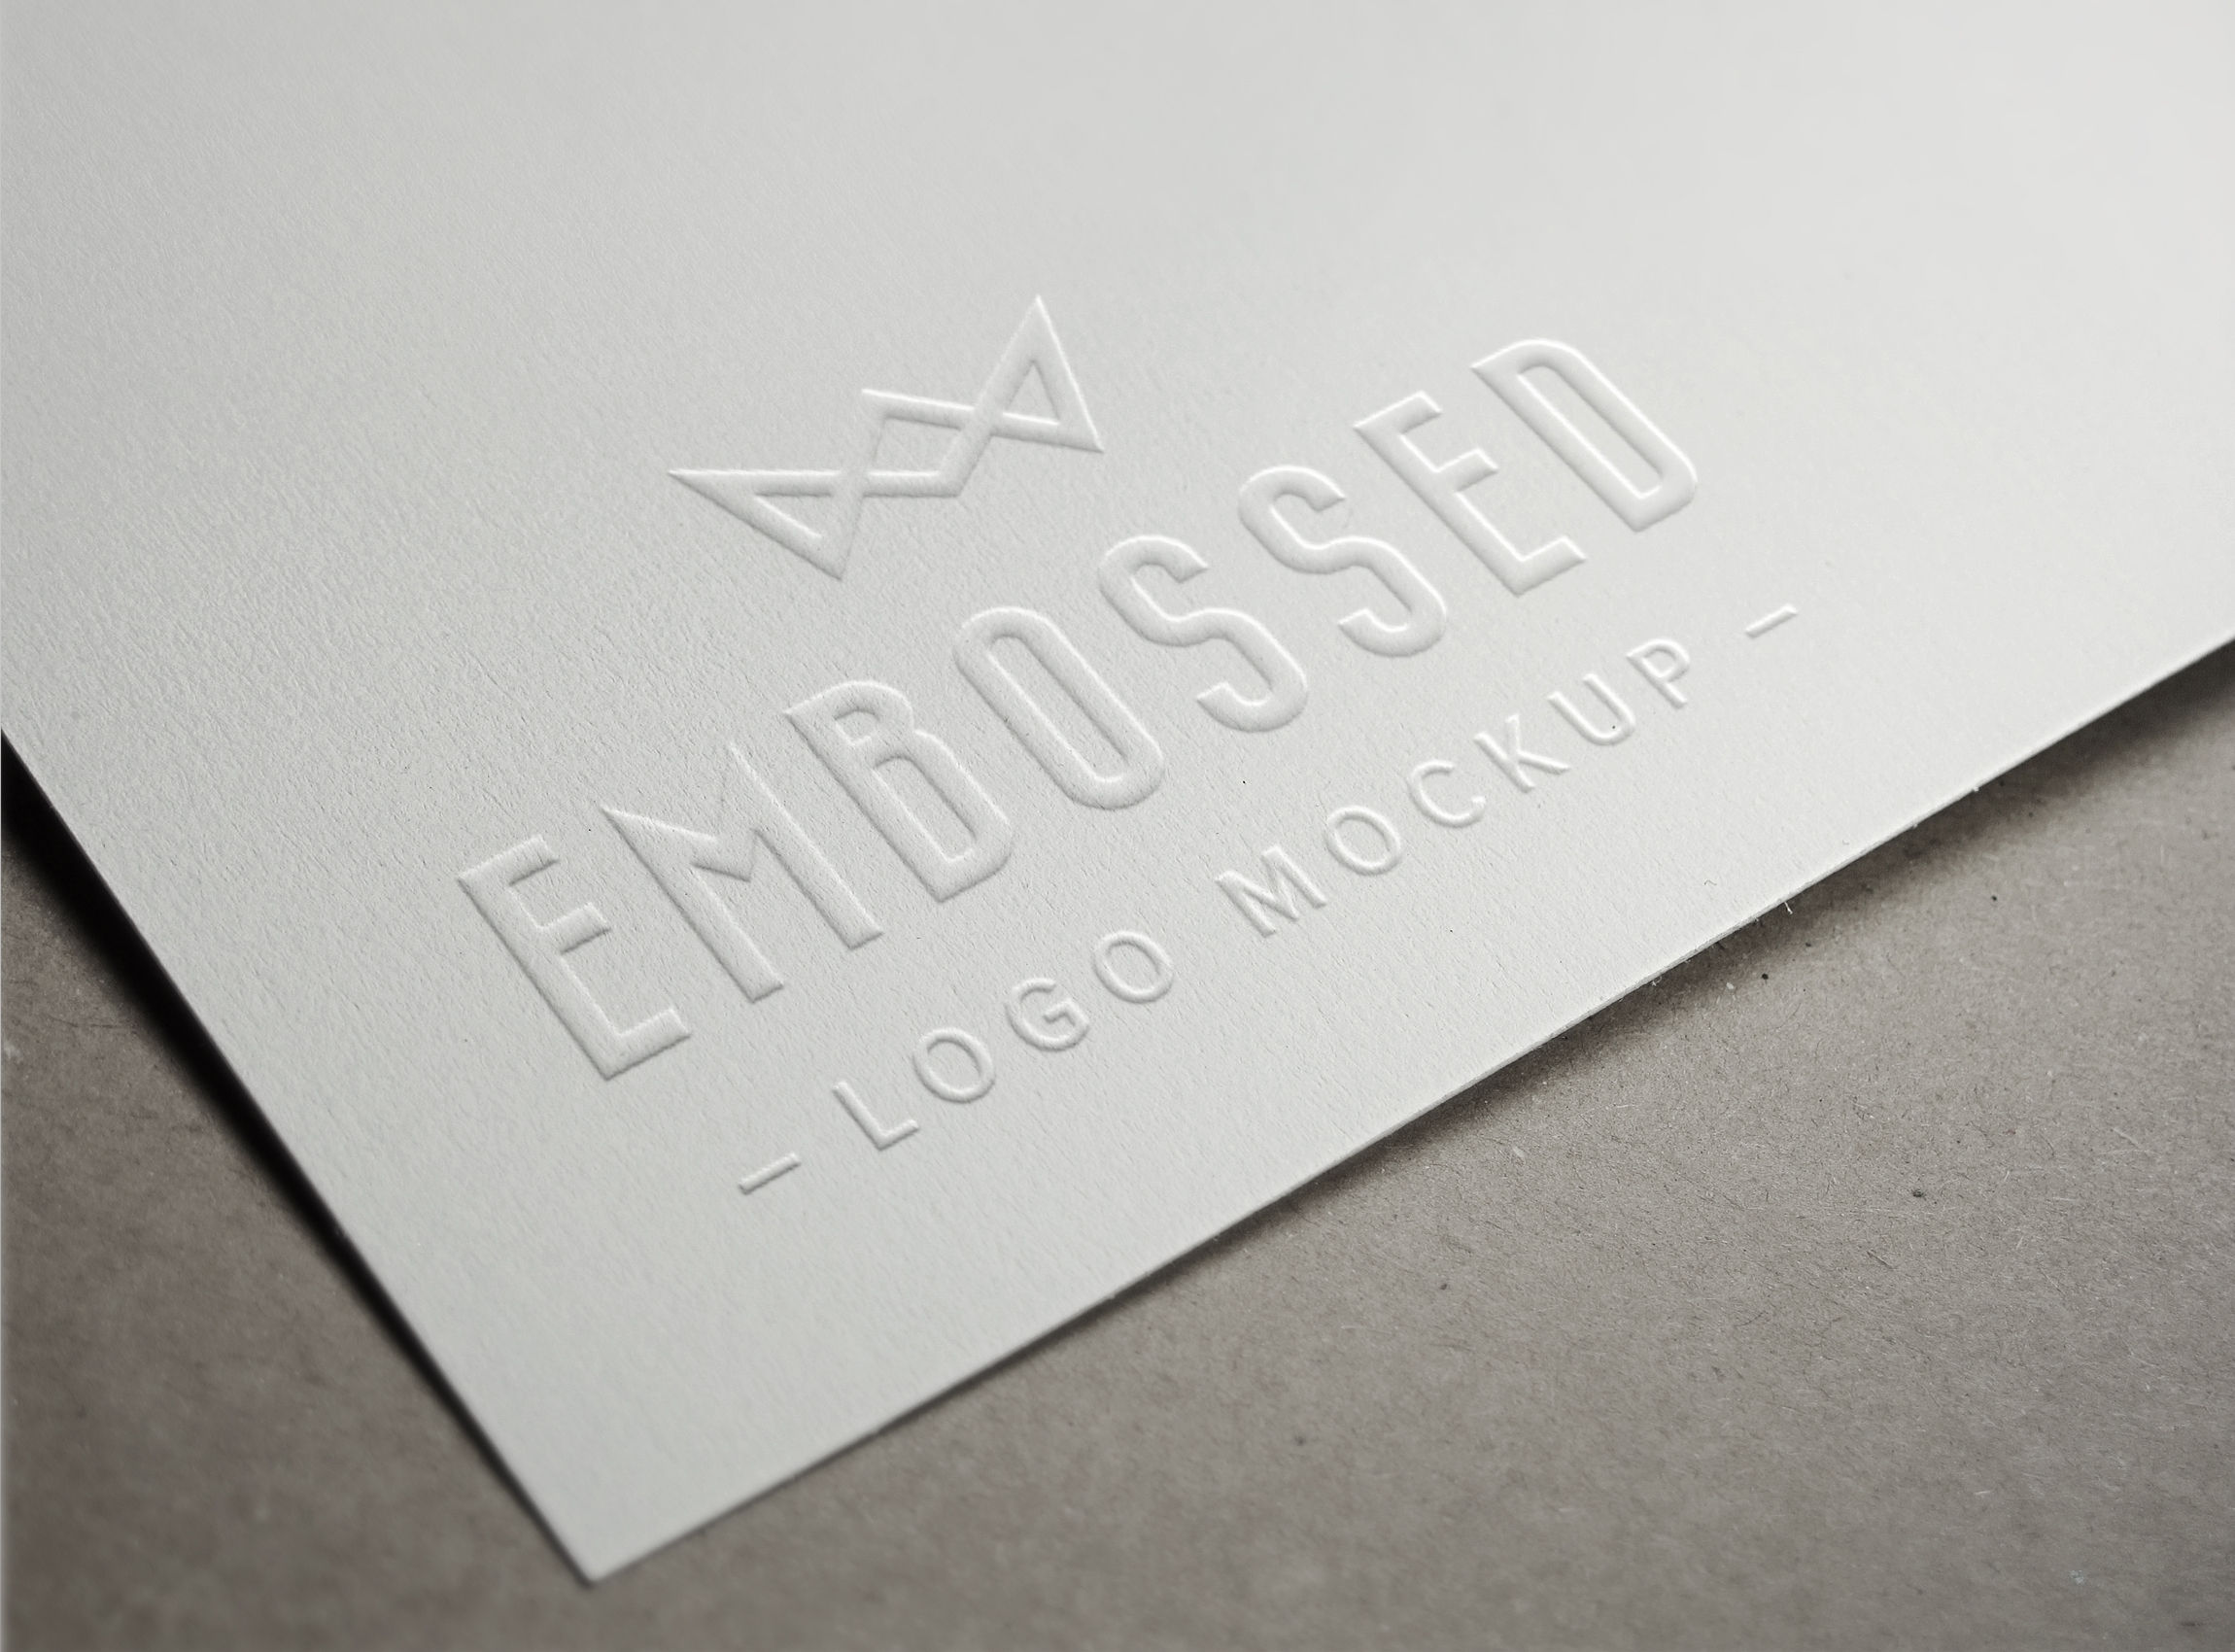 Bien-aimé Embossed Paper Logo MockUp | GraphicBurger FV12